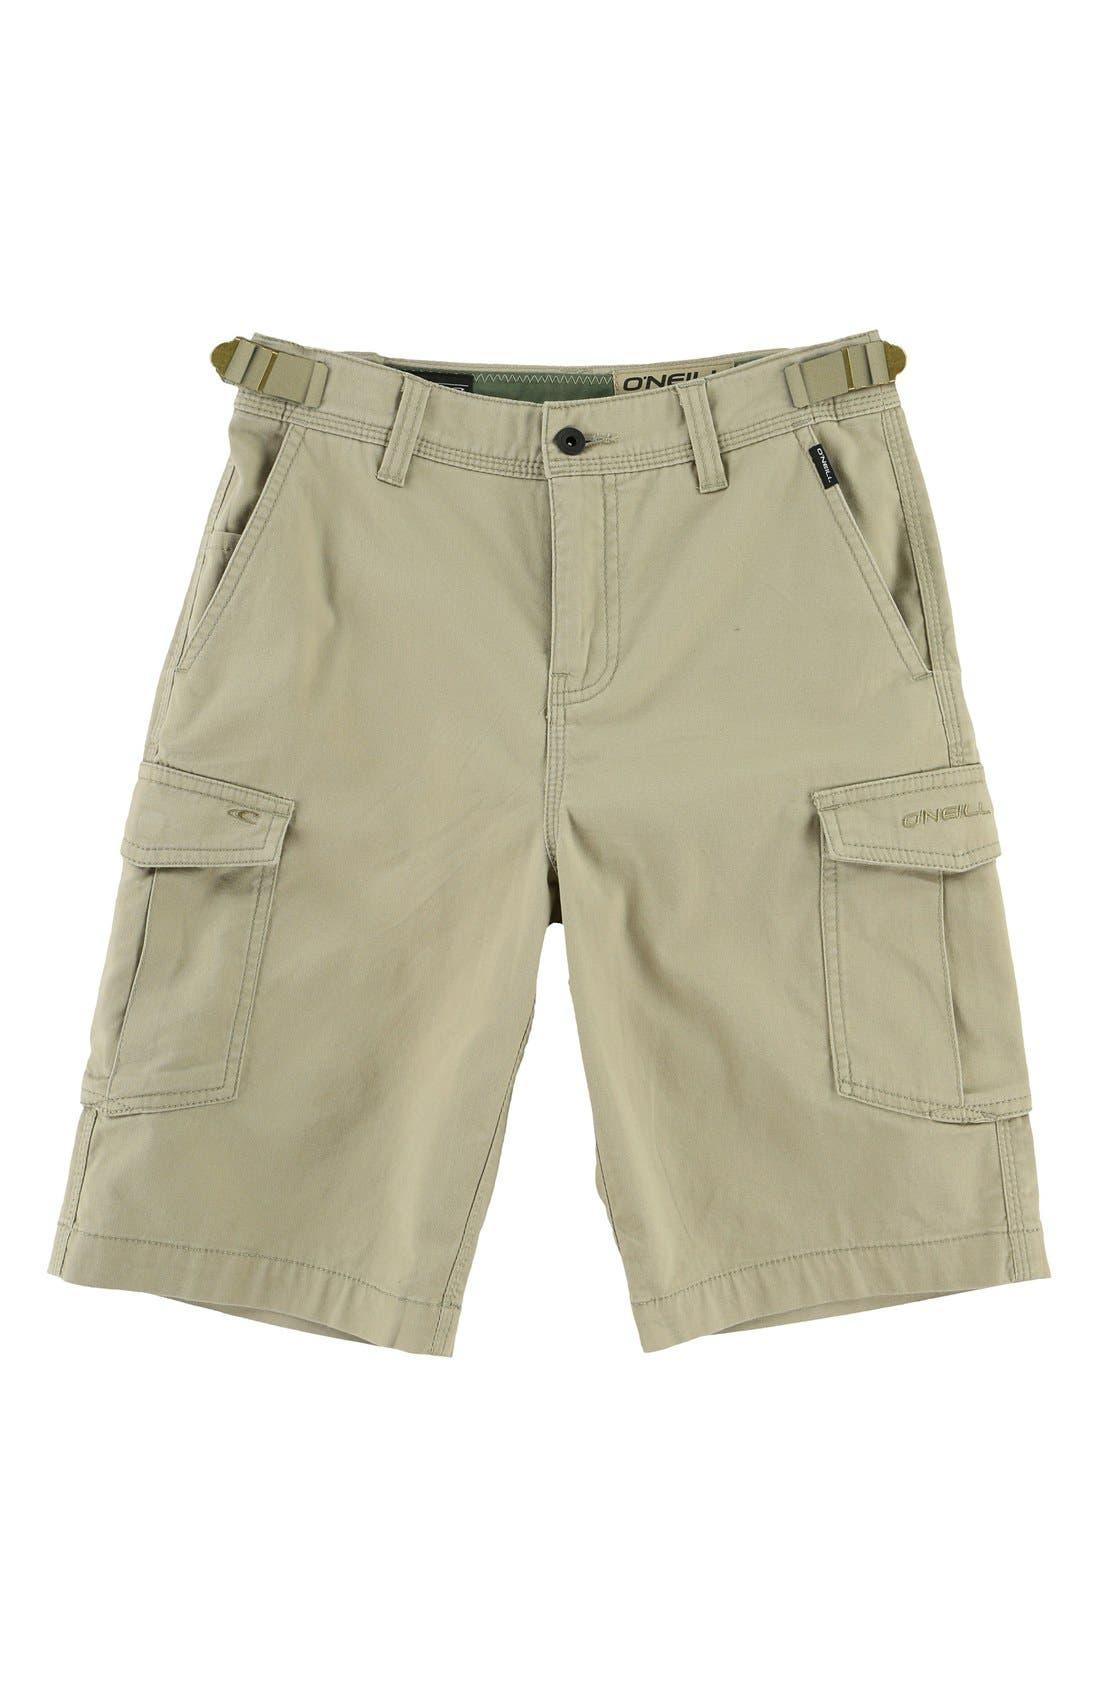 El Toro Cargo Shorts,                         Main,                         color, Khaki